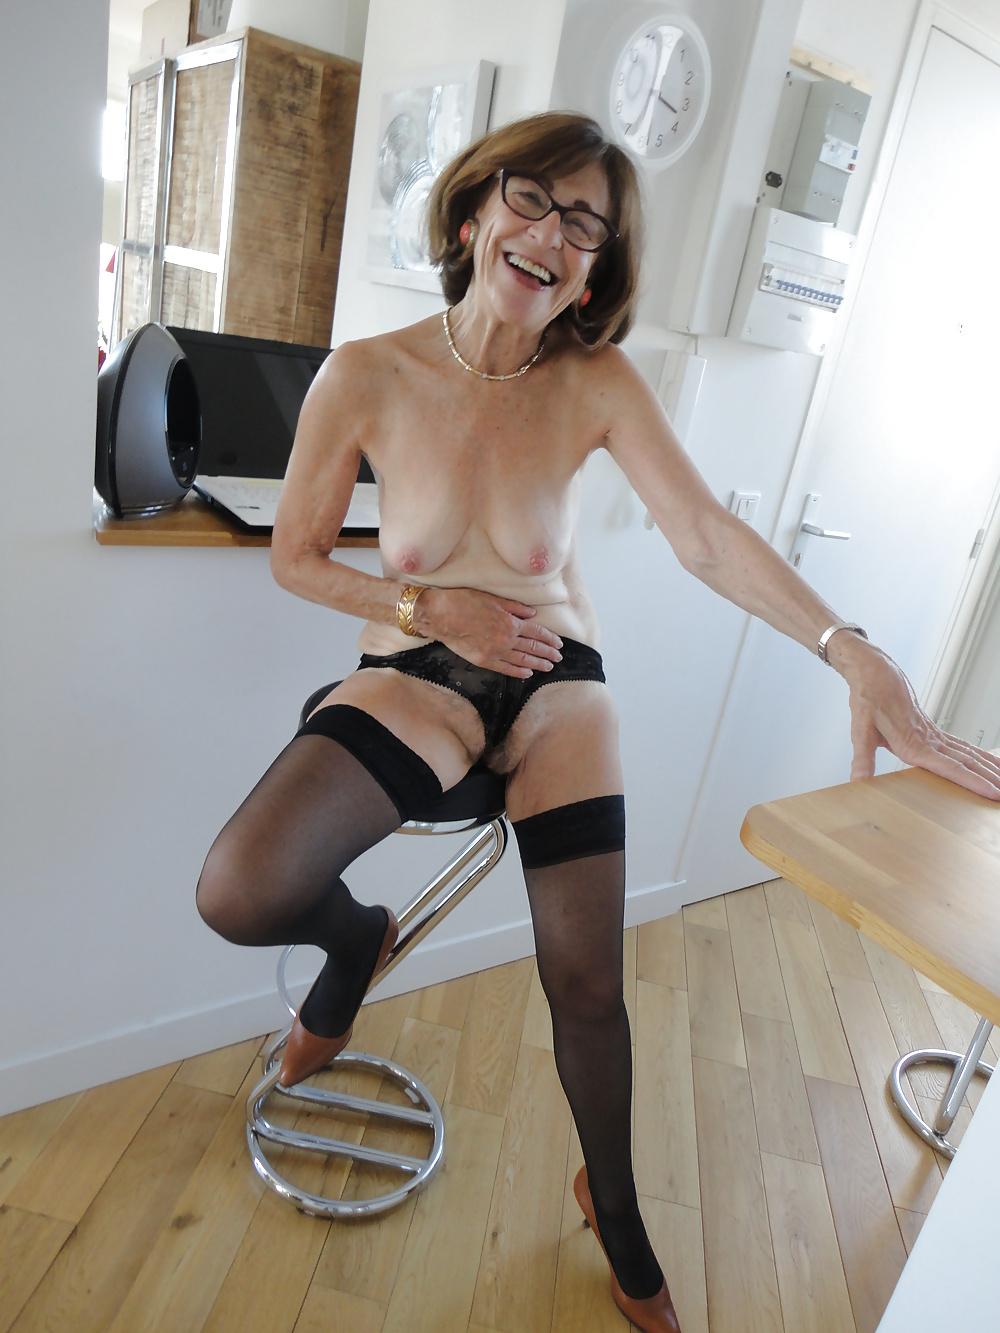 Mrs. michaels sex video